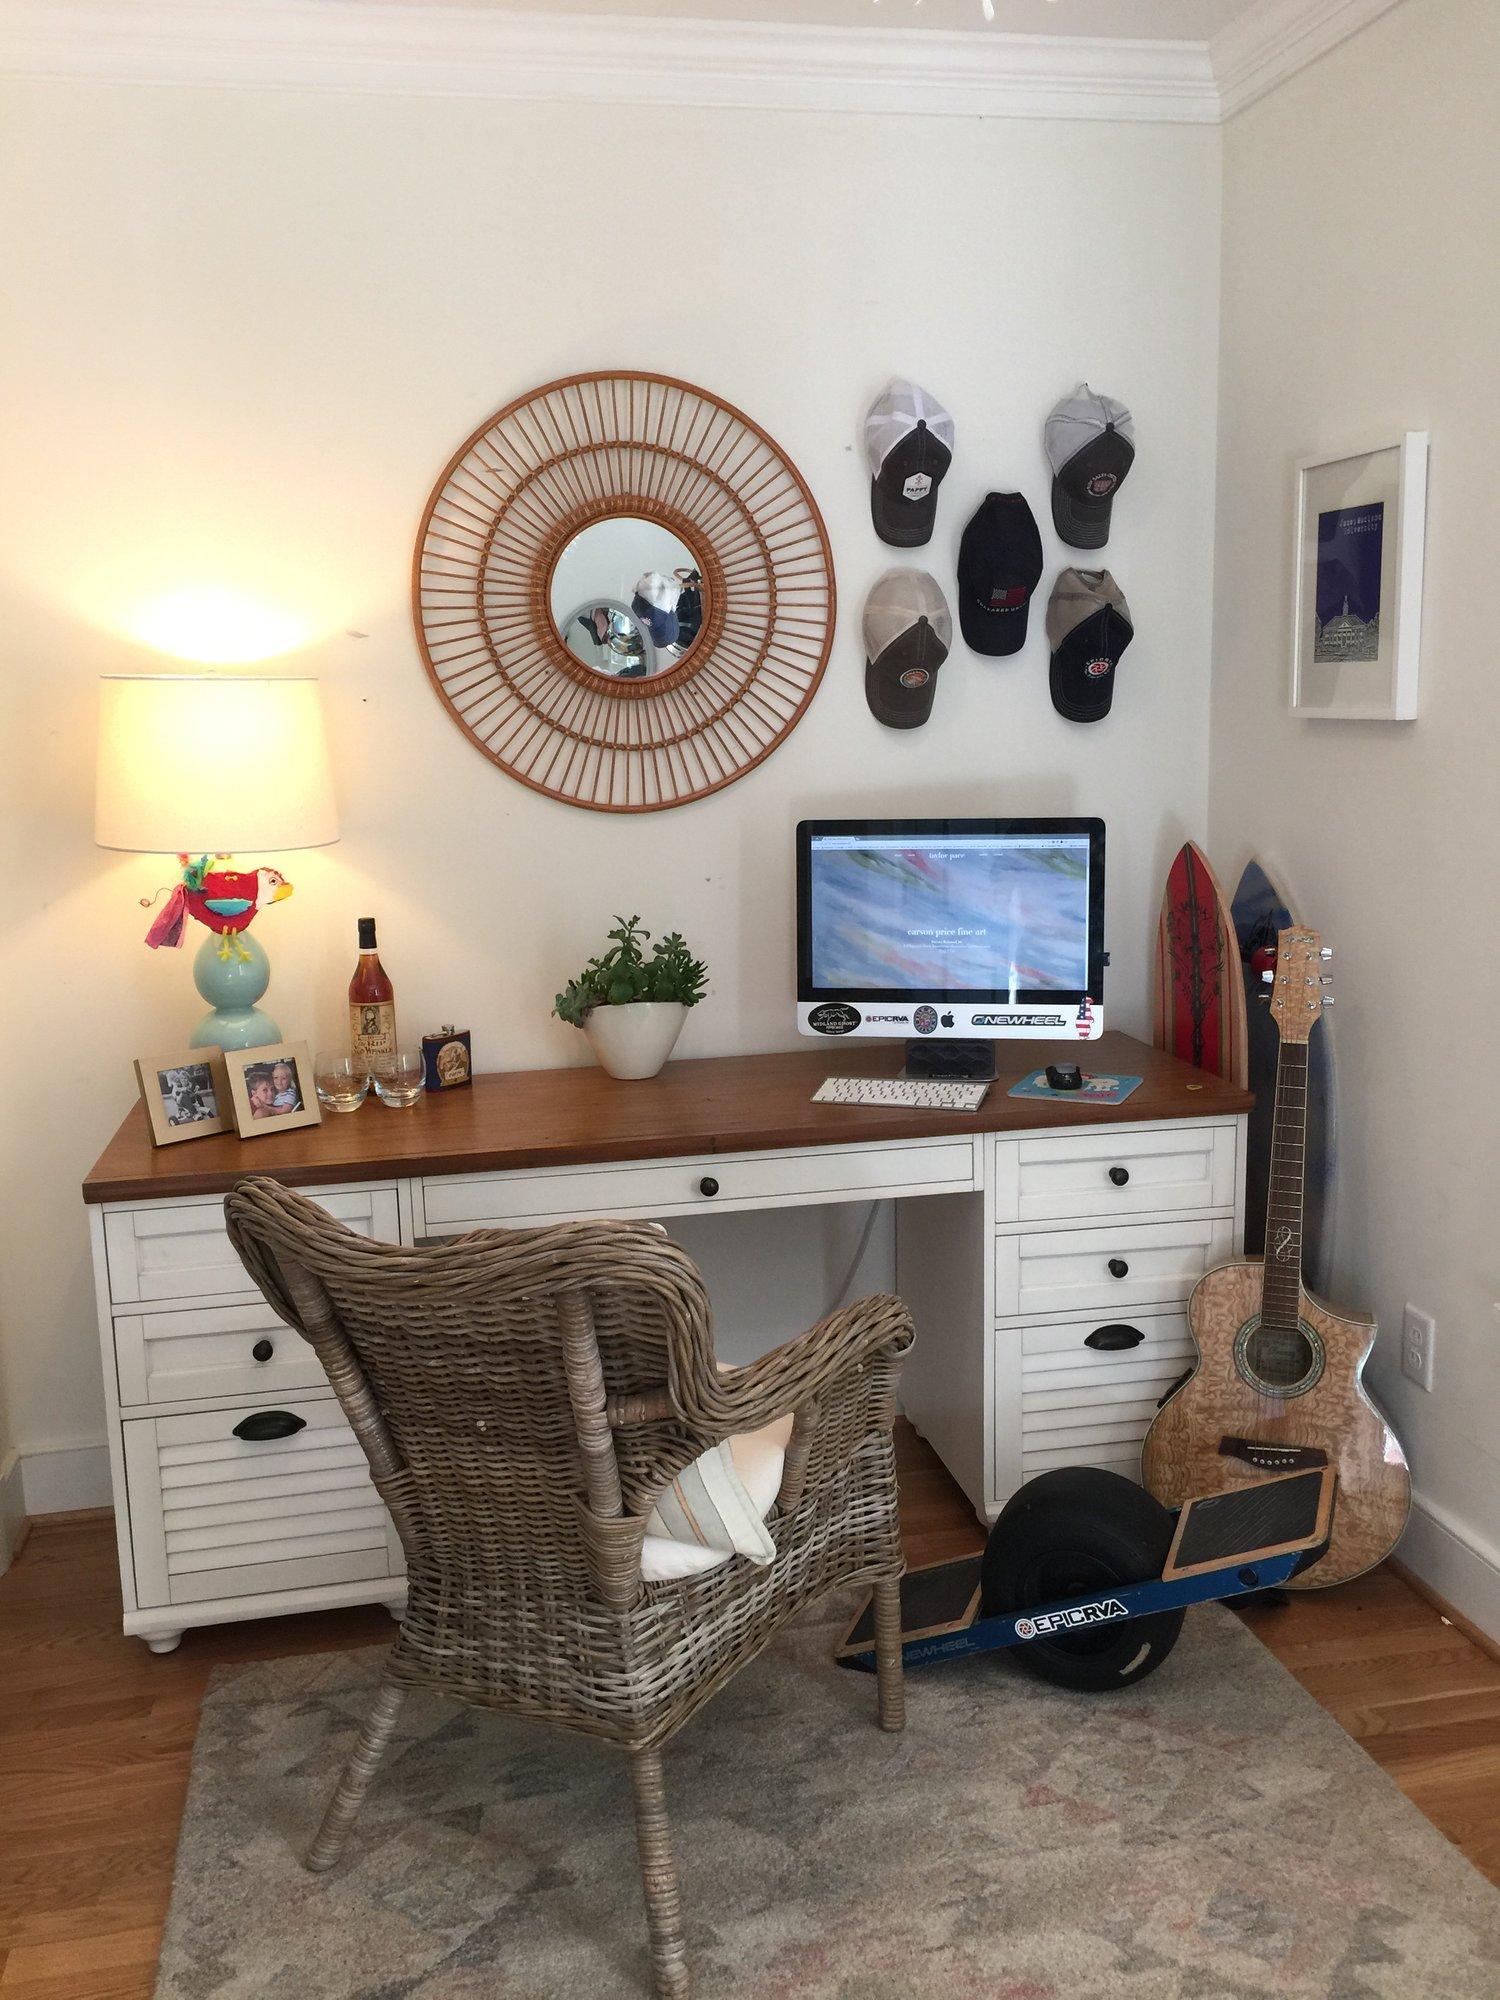 e web clay interior rental virginia properties designers va piperbear design east richmond st street